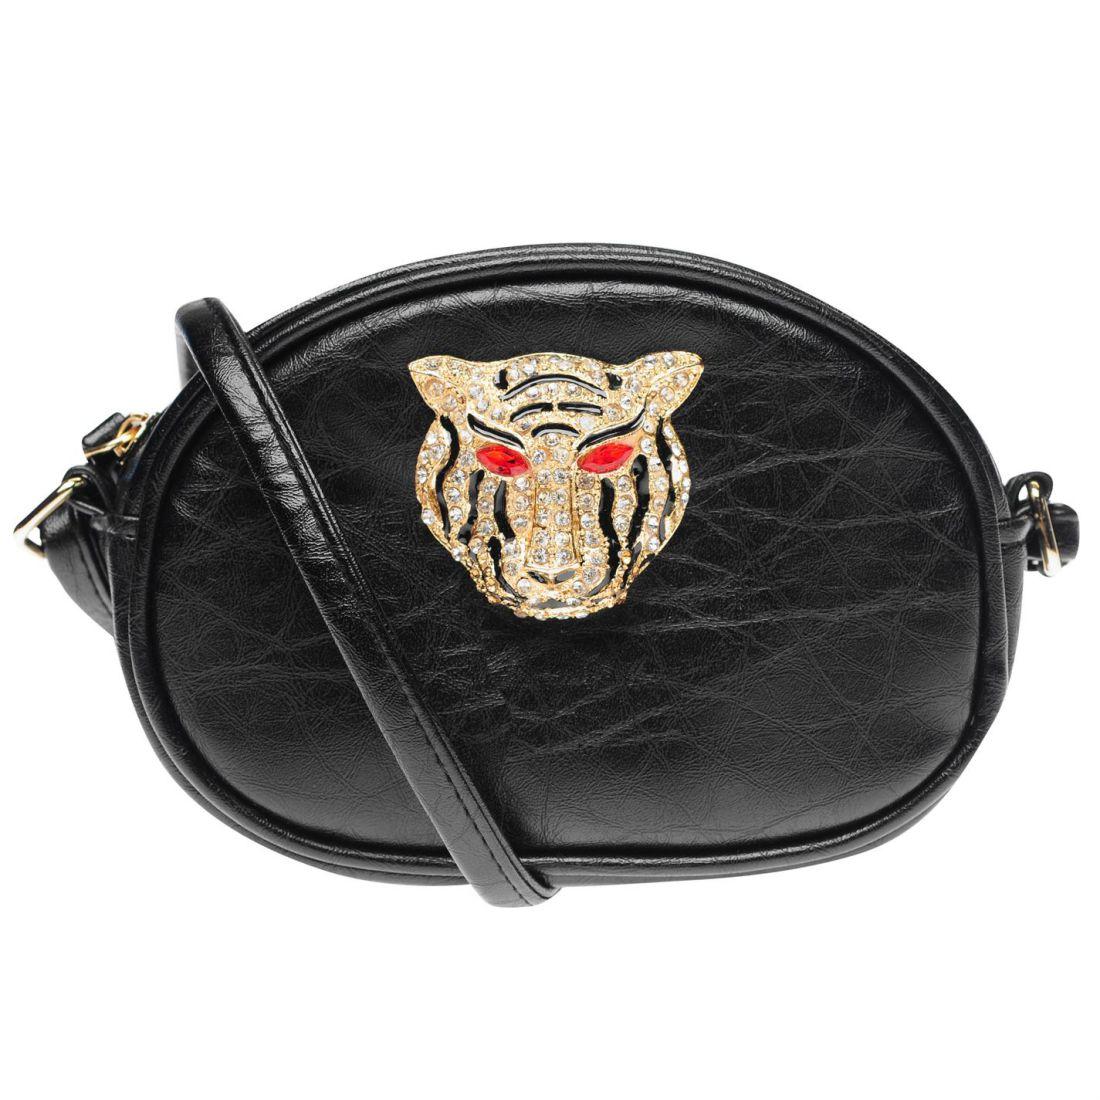 Womens-Glamorous-Lion-Shoulder-Bag-Zip-New